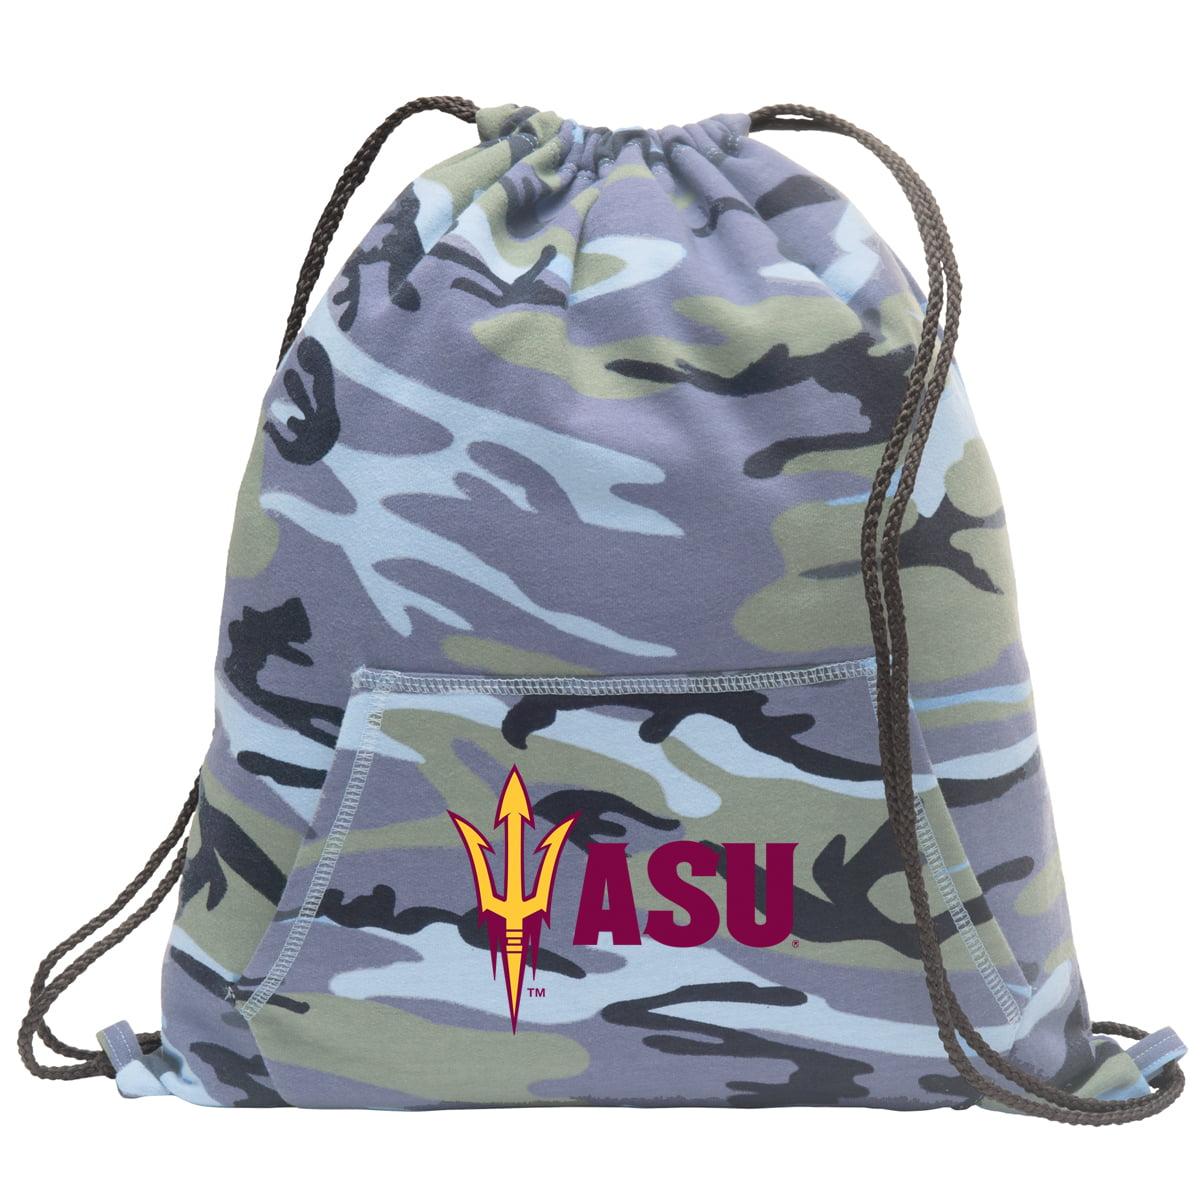 ASU Drawstring Bag Blue Camo Official Arizona State Cinch Backpack for Boys Girls Men Women